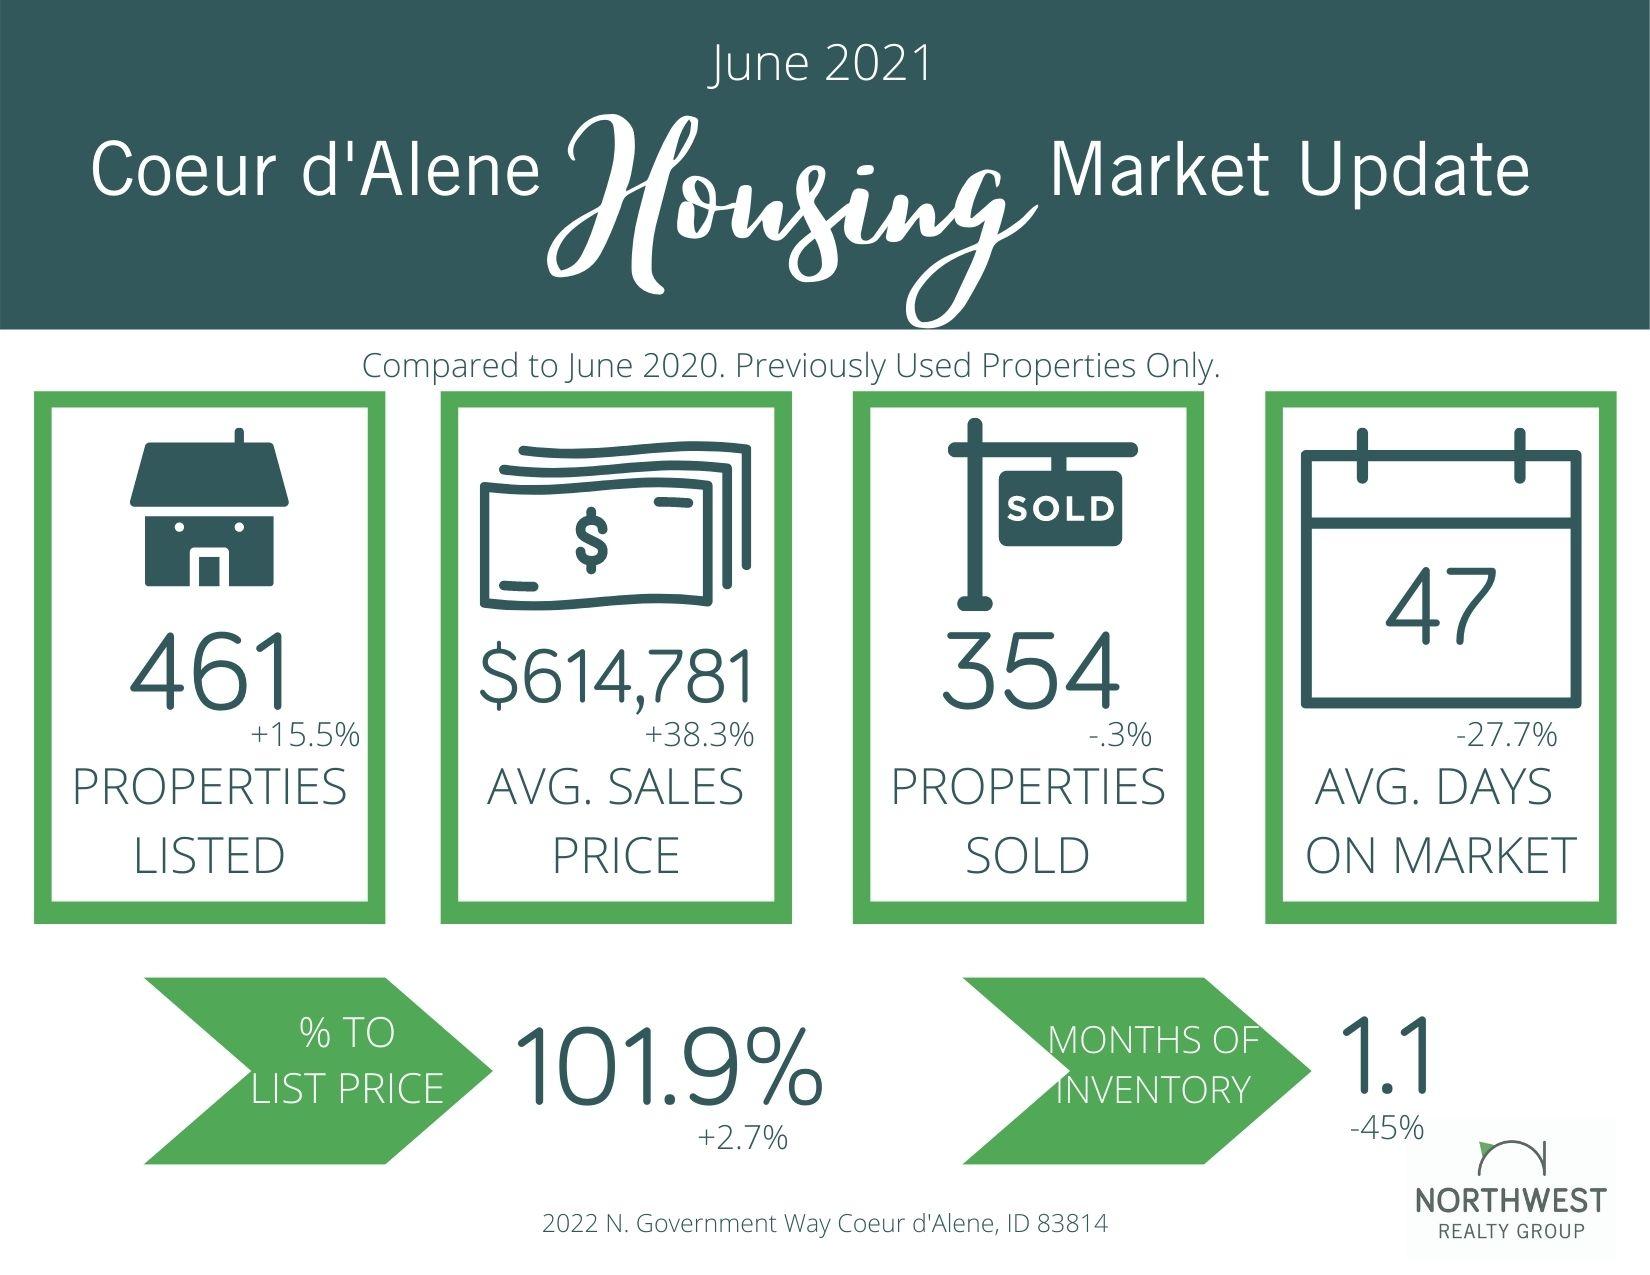 June 2021 Coeur d'Alene Area Market Update